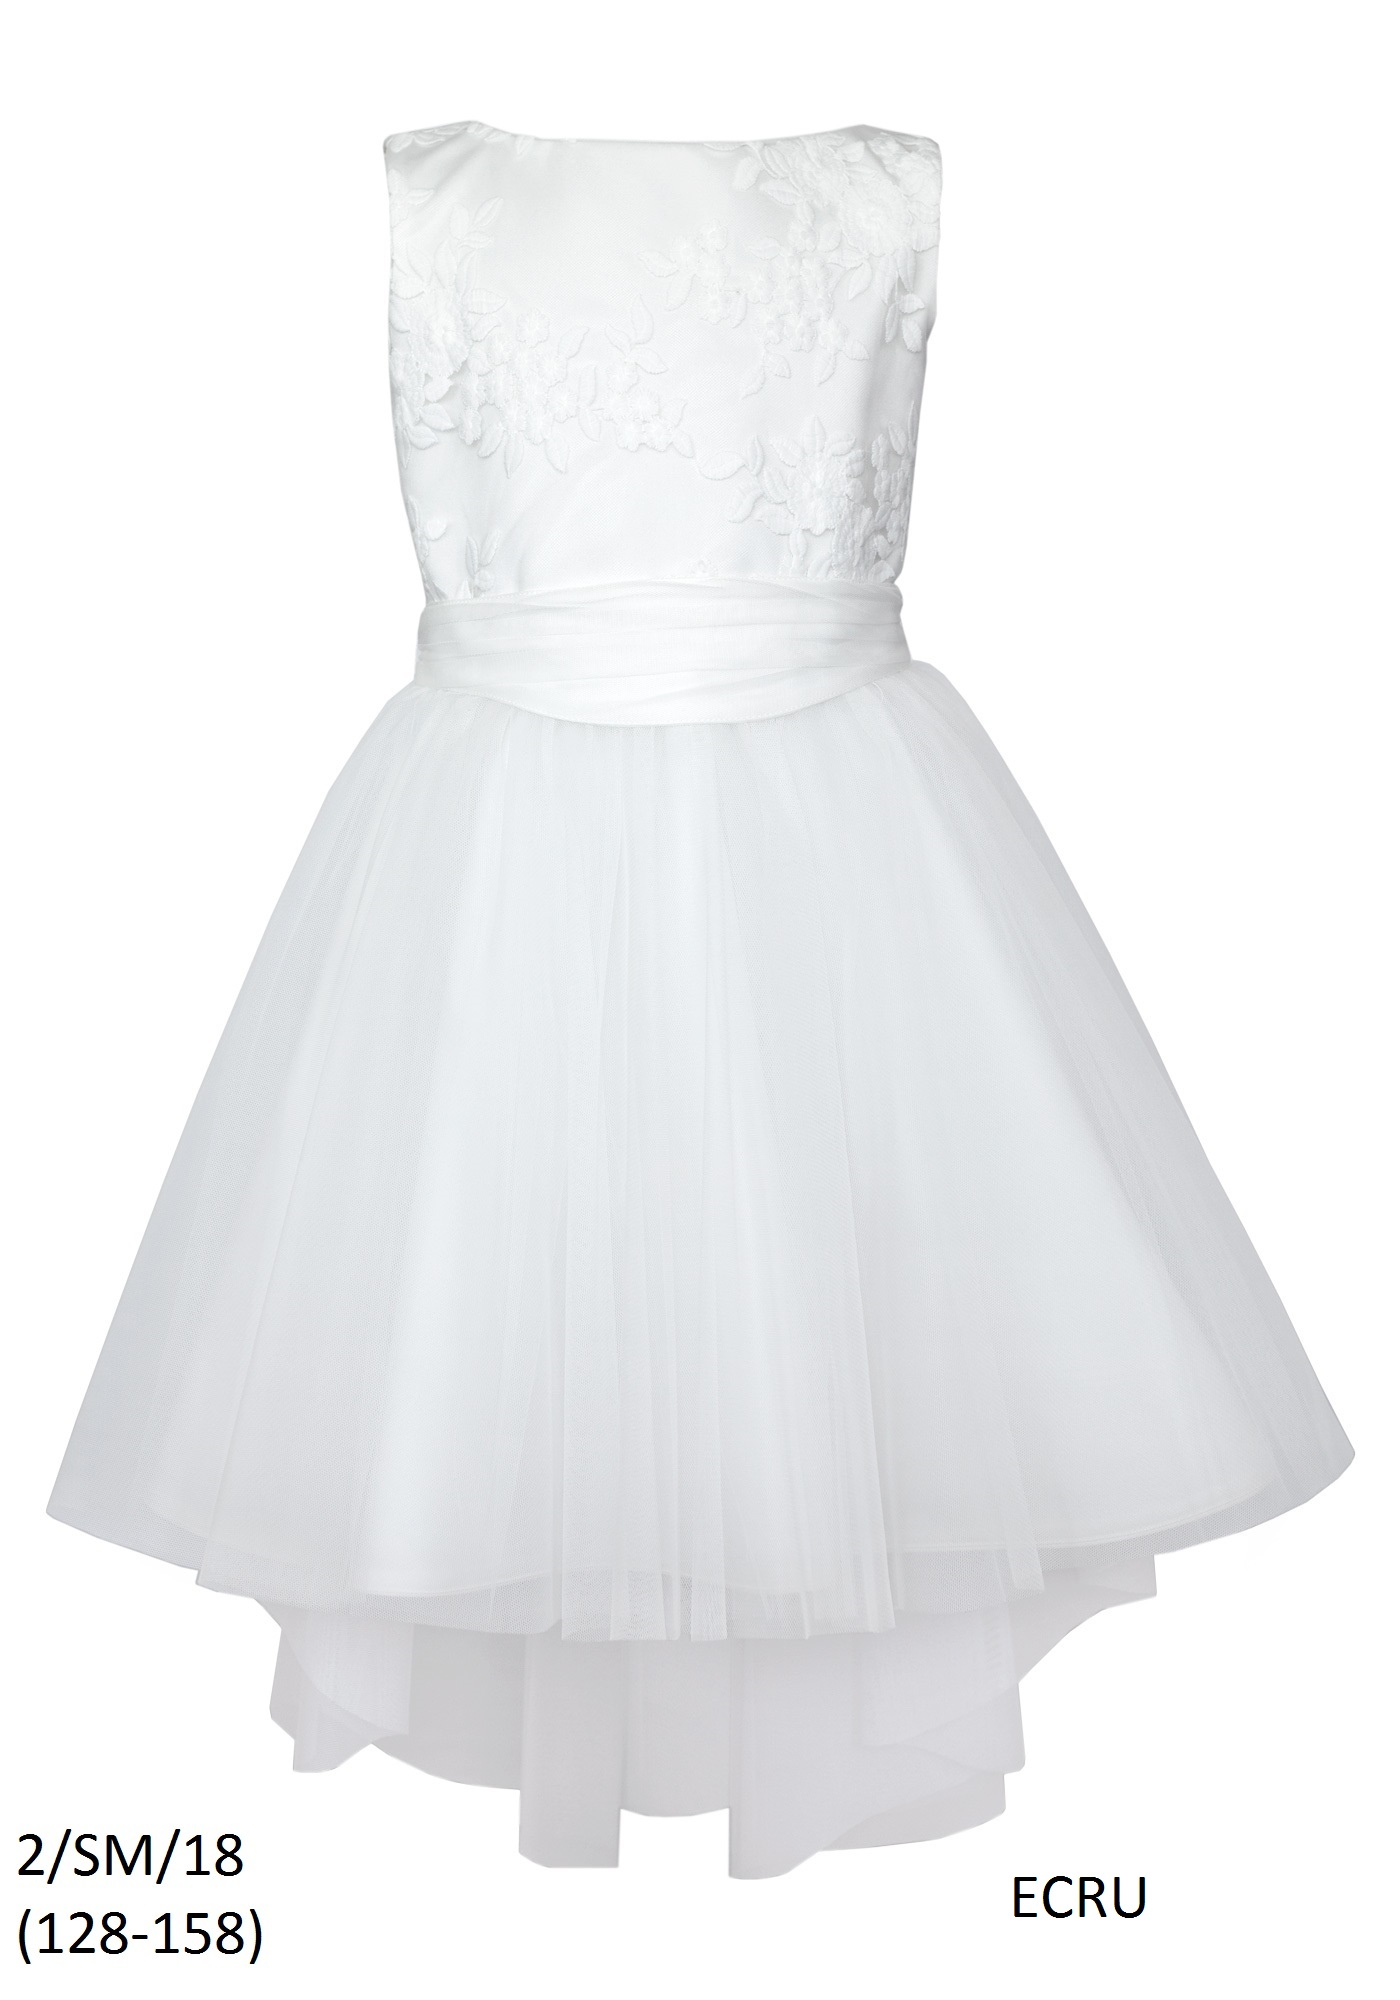 0e1d3394 Tiulowa Elegancka Sukienka do Komunii rozm.146 - 7165074462 ...